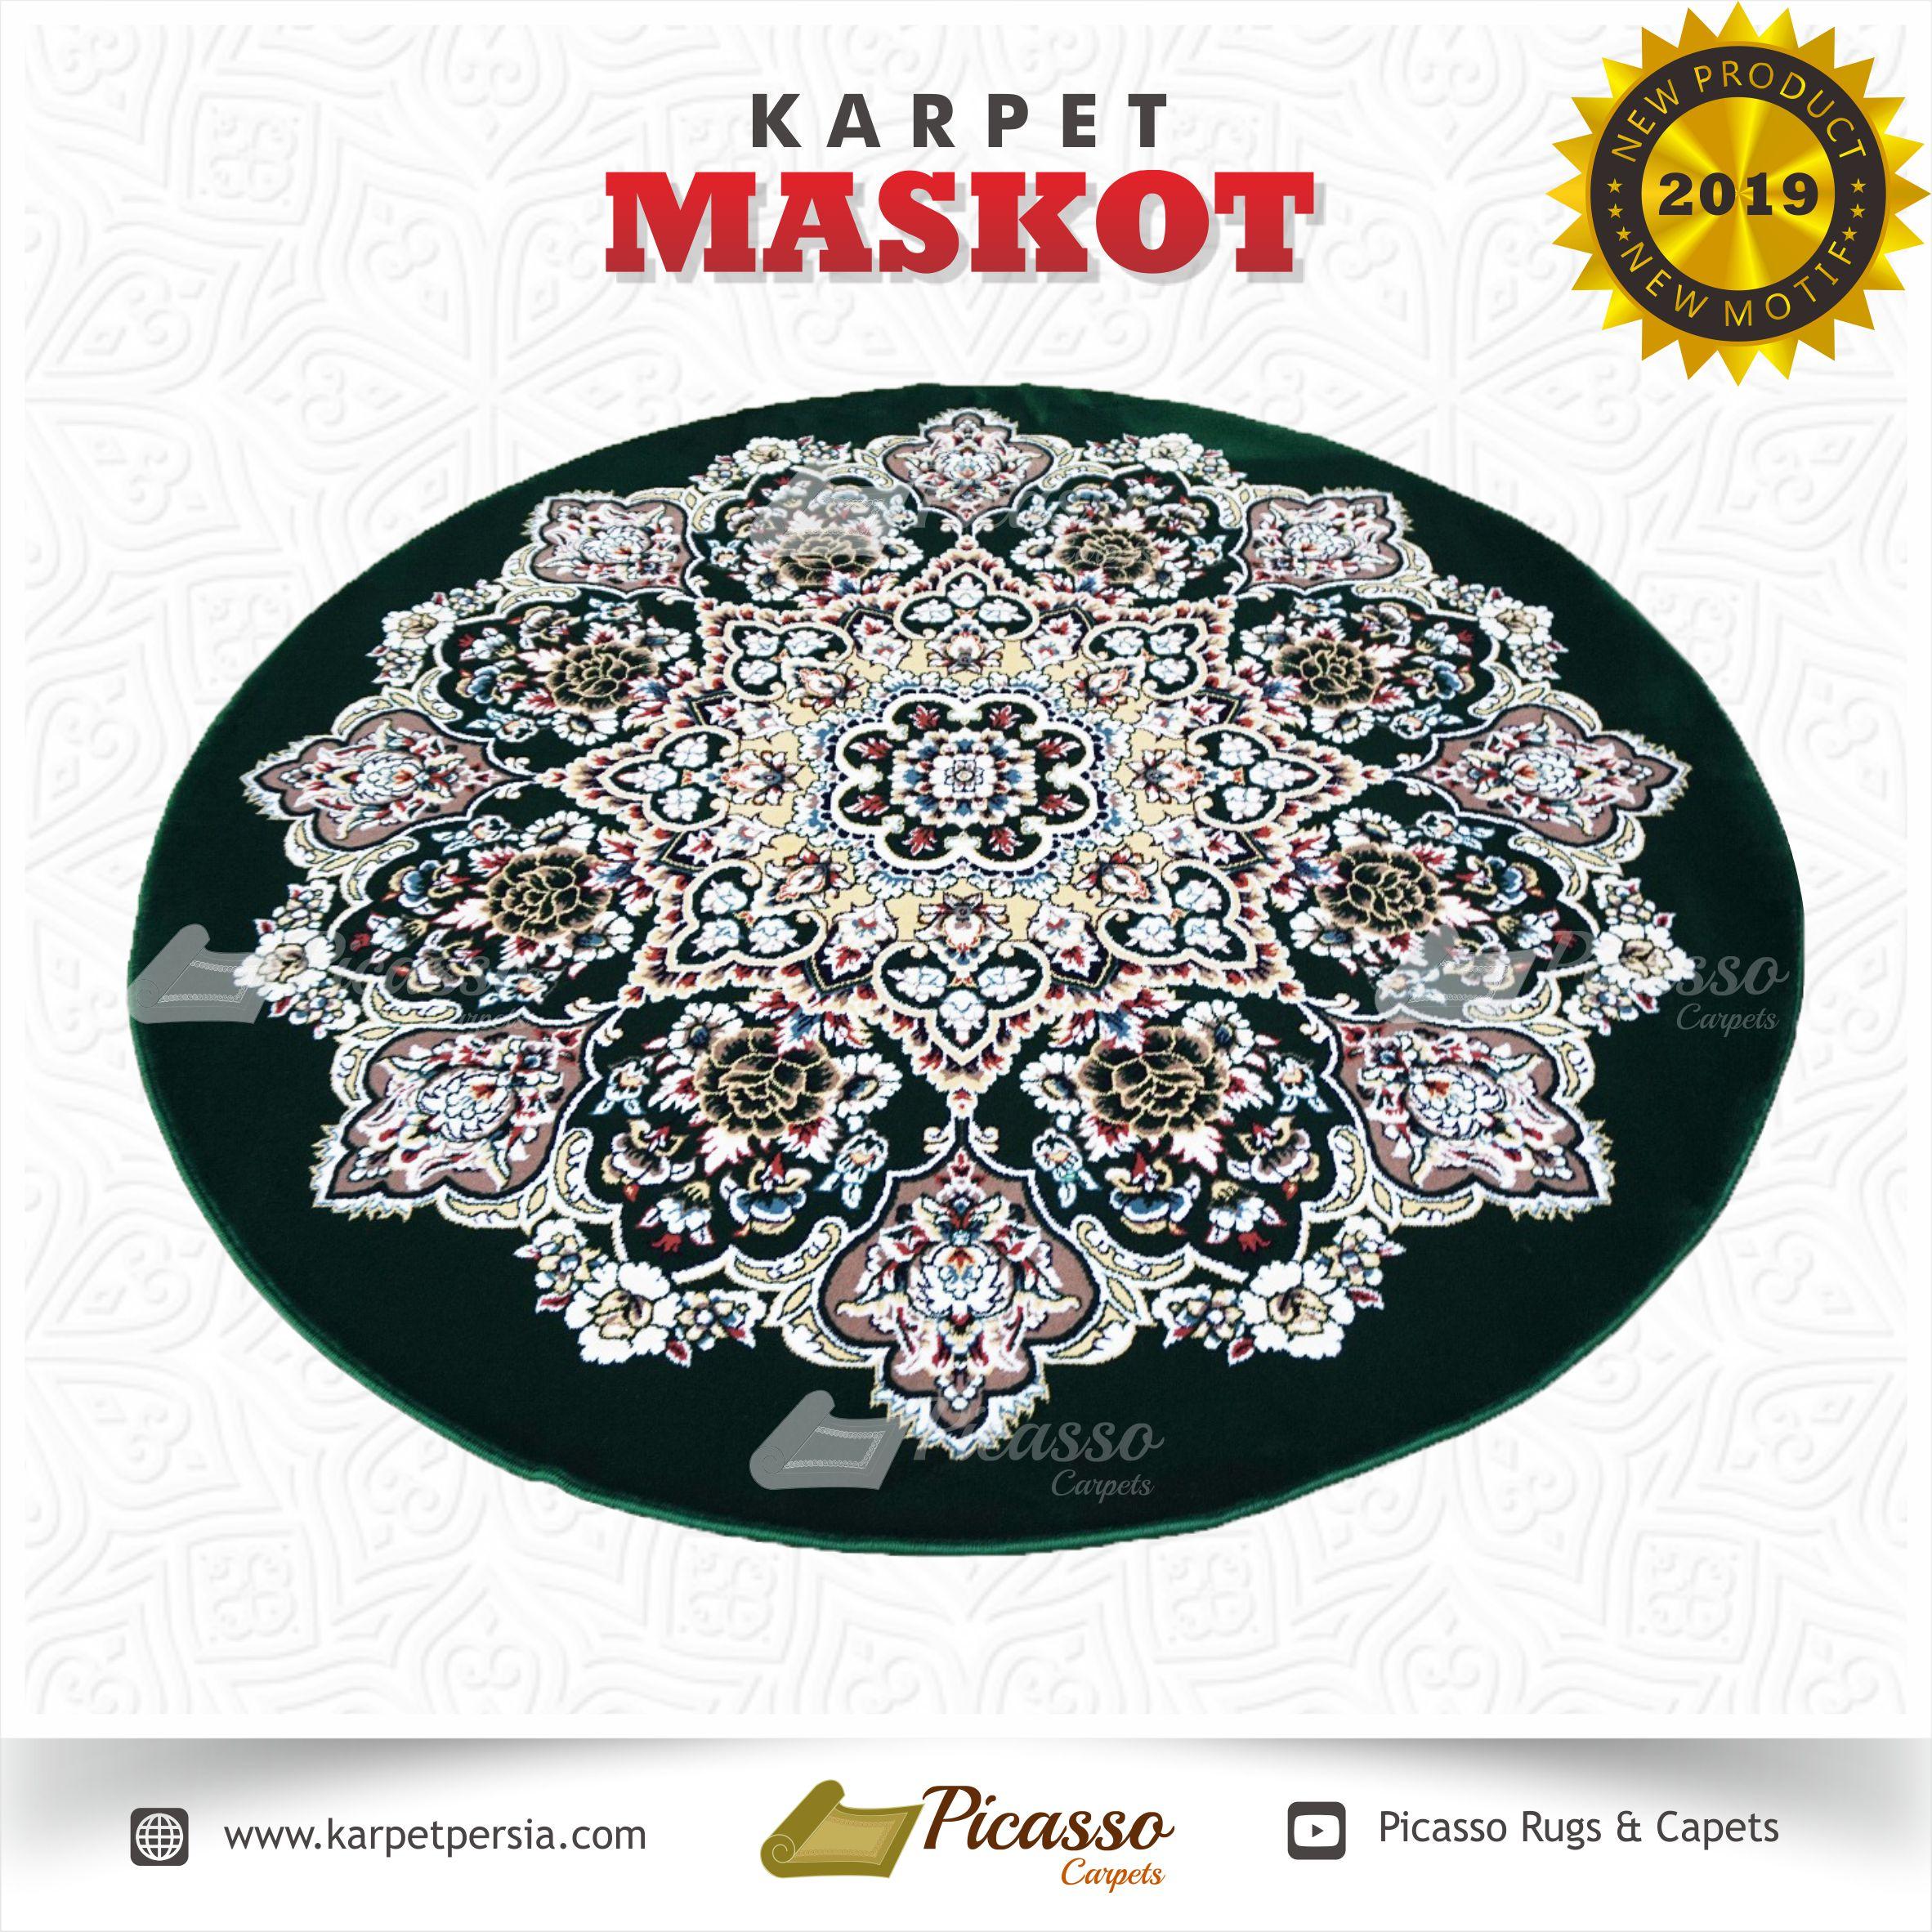 karpet masjid maskot